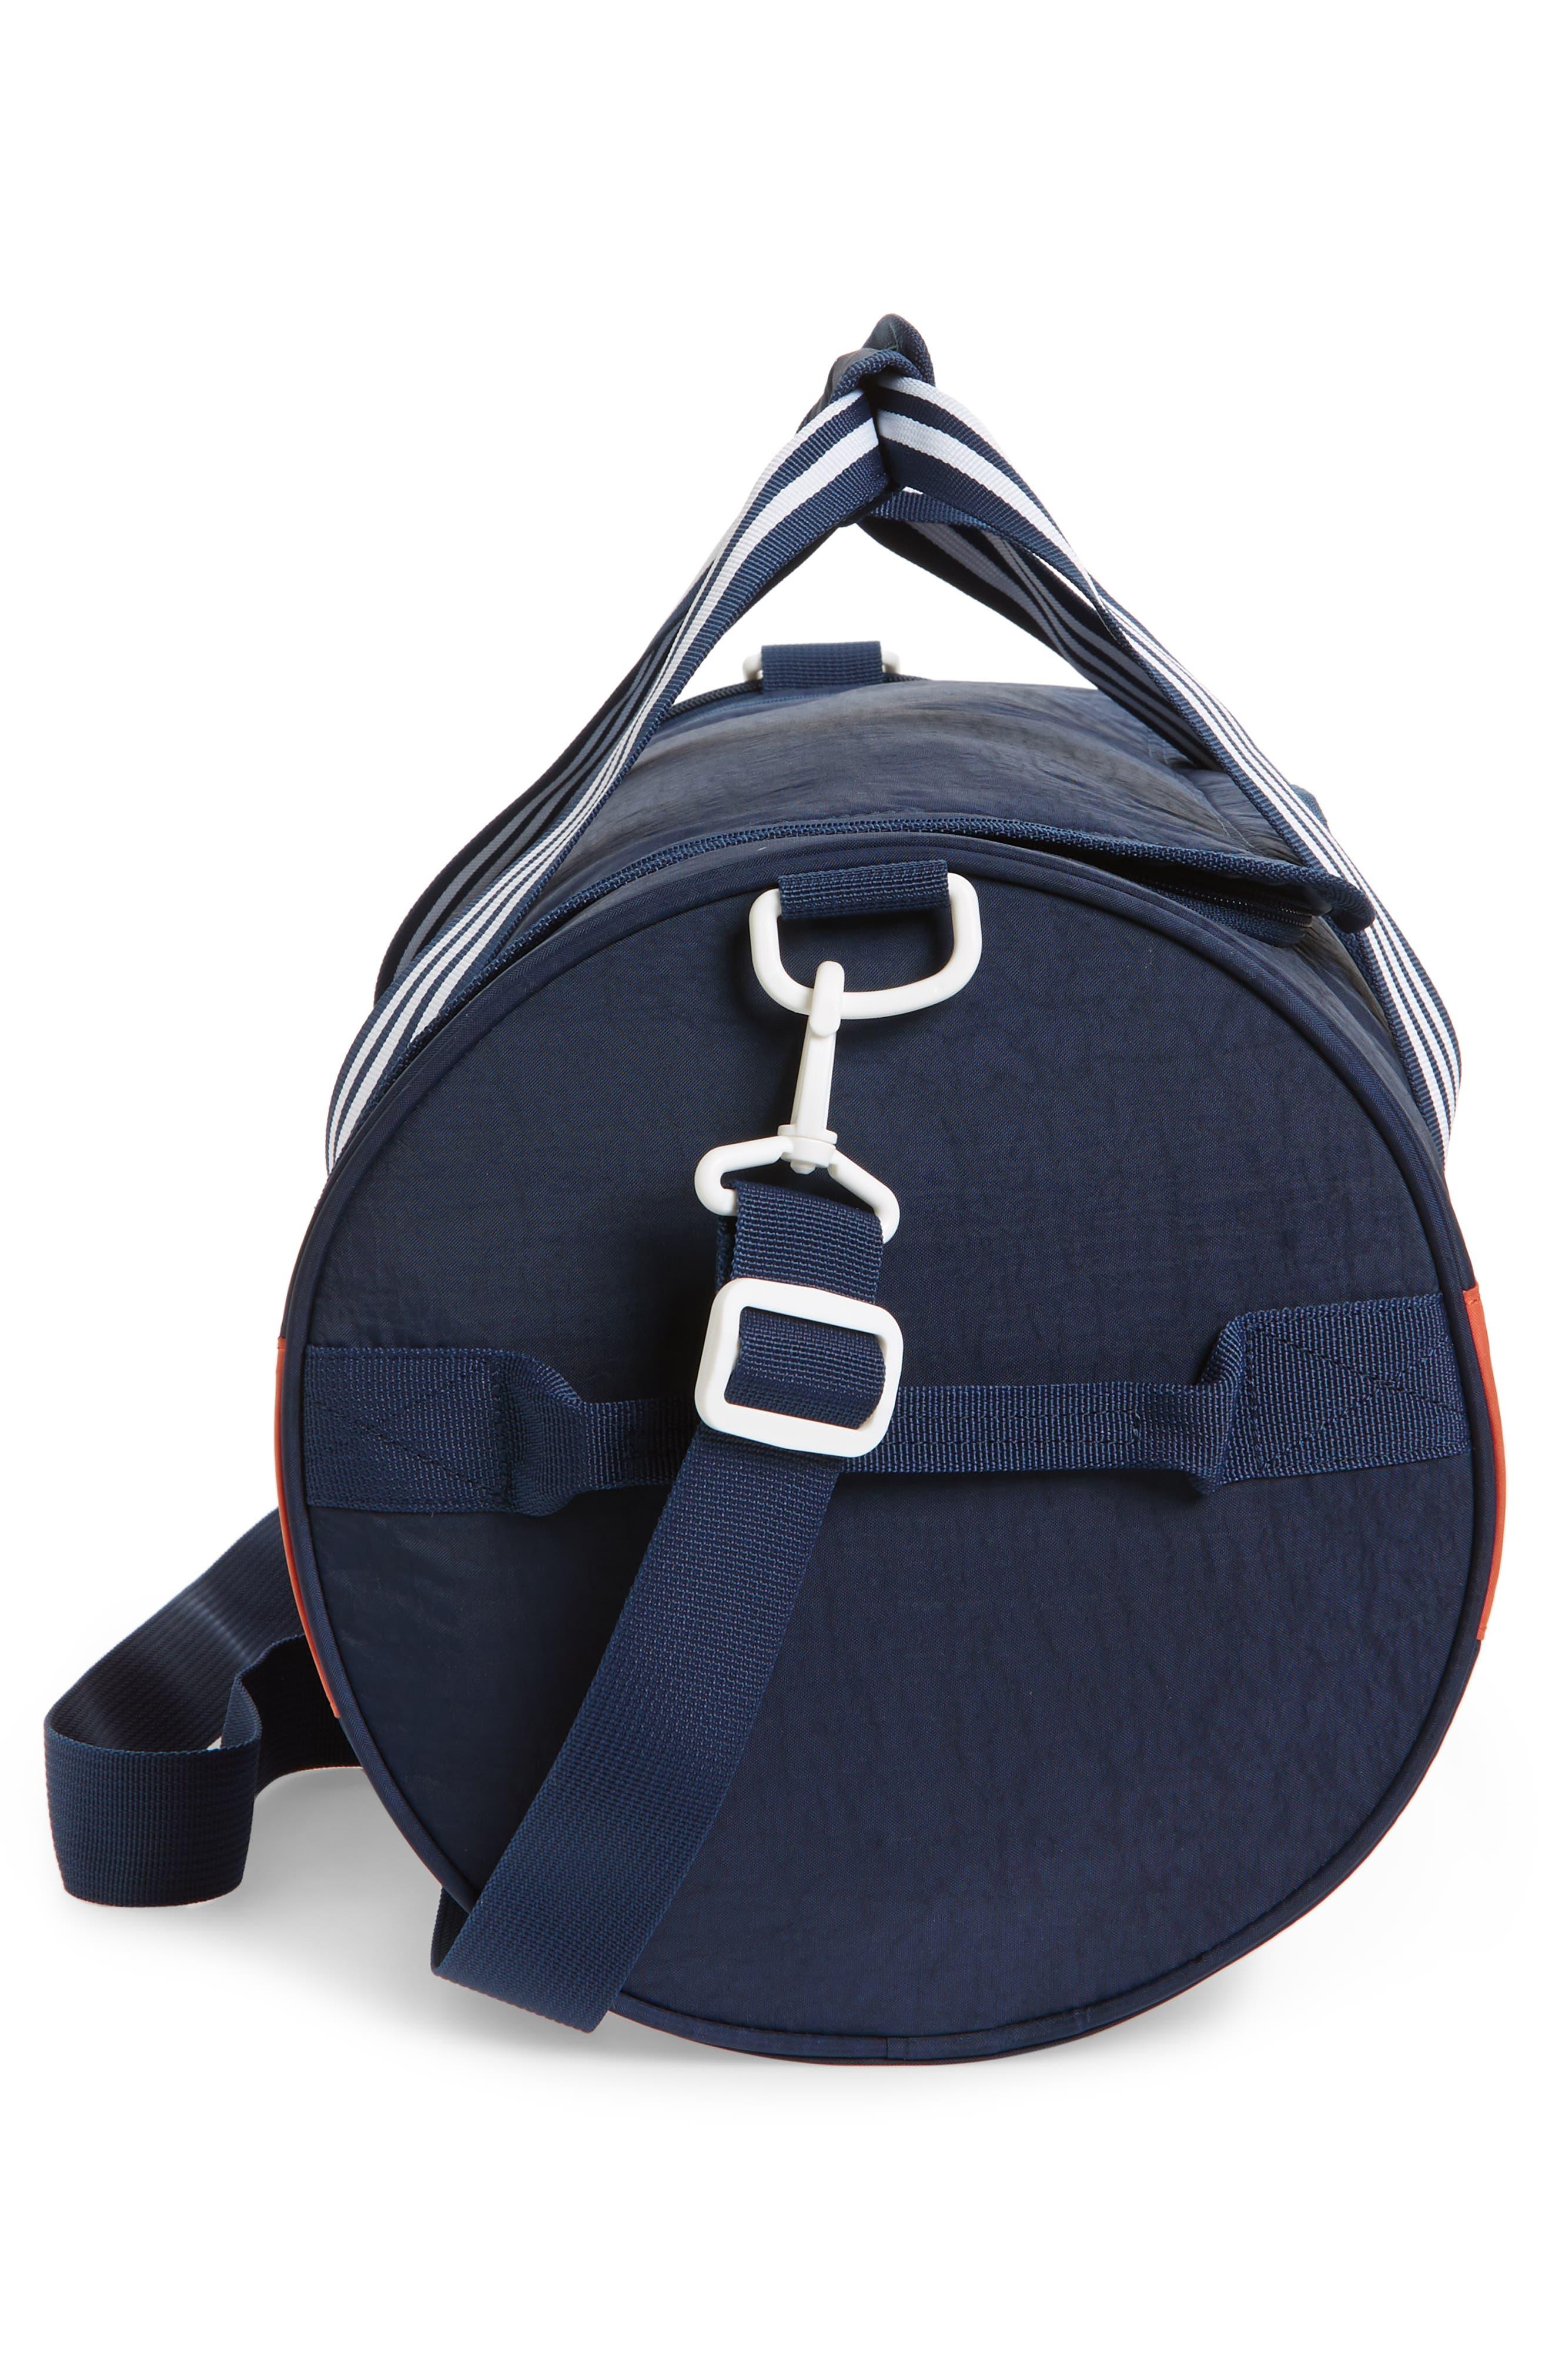 ADIDAS ORIGINALS, adidas Spirit Roll Duffle Bag, Alternate thumbnail 5, color, COLLEGIATE NAVY/ AMBER/ WHITE